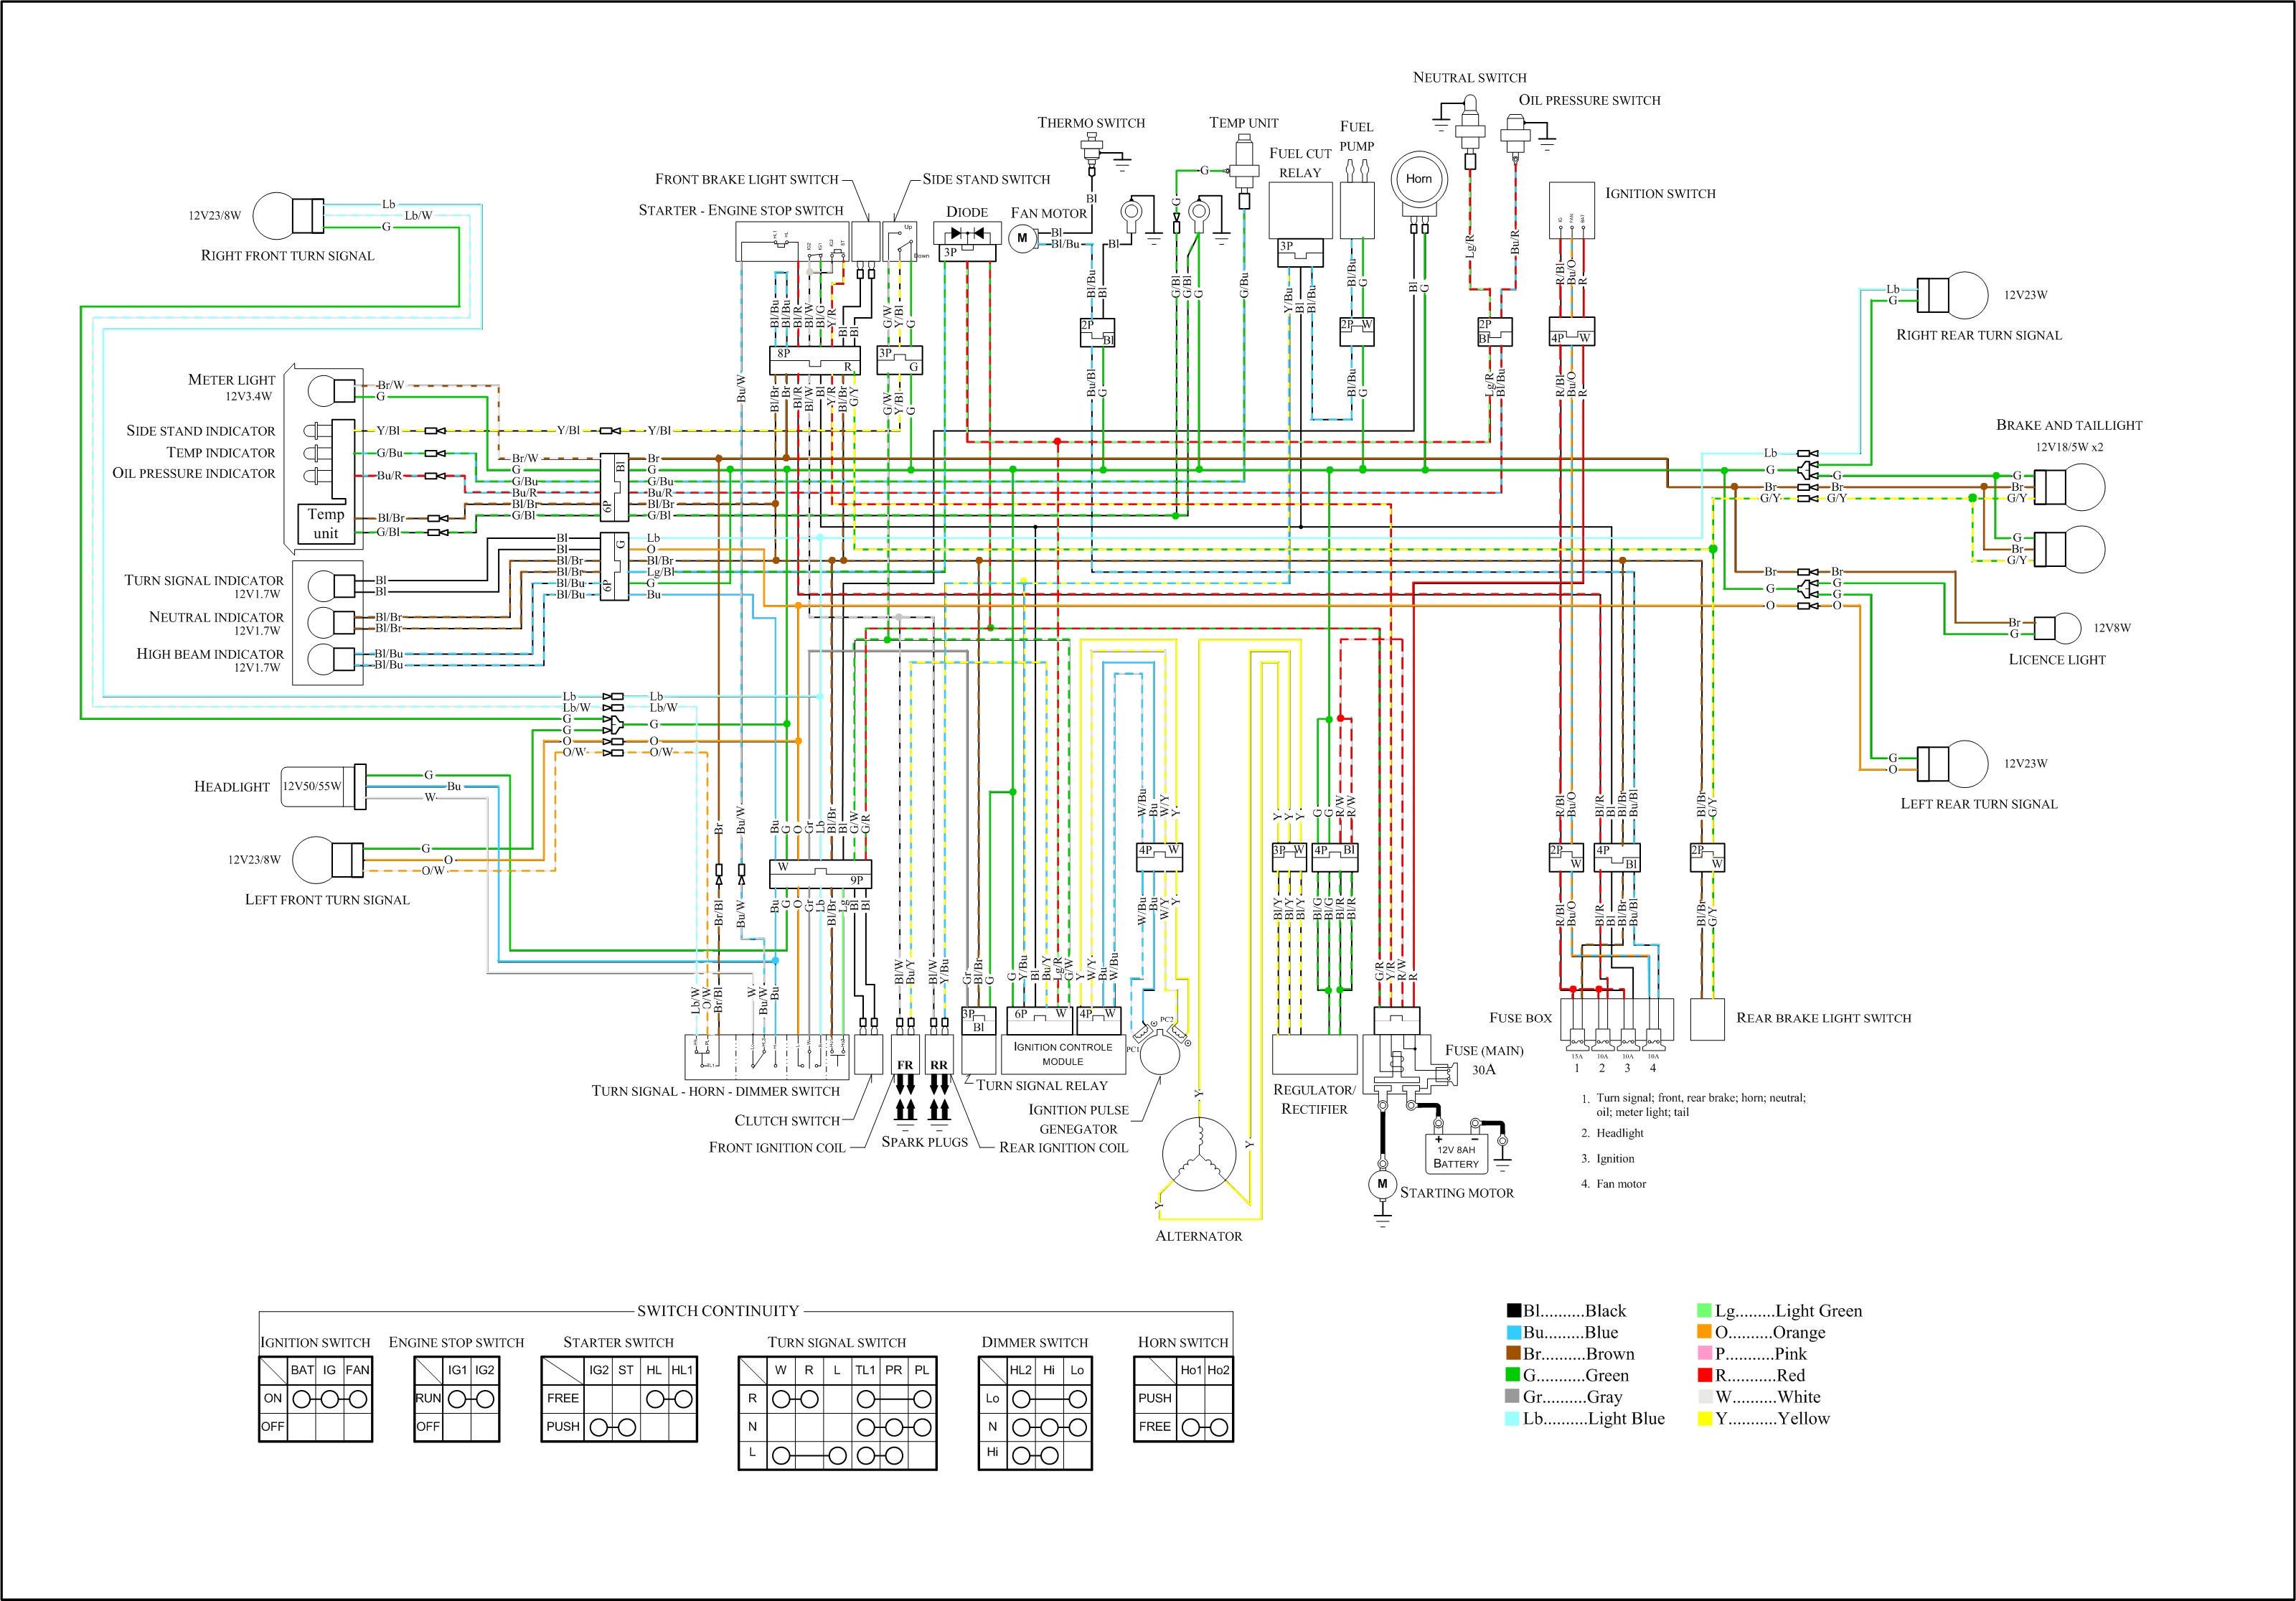 Vt750dc Wiring Diagram Auto Electrical 5150 Kikker Bobber Honda Cbf 250 Co To Za Cz U0119 U015b U0107